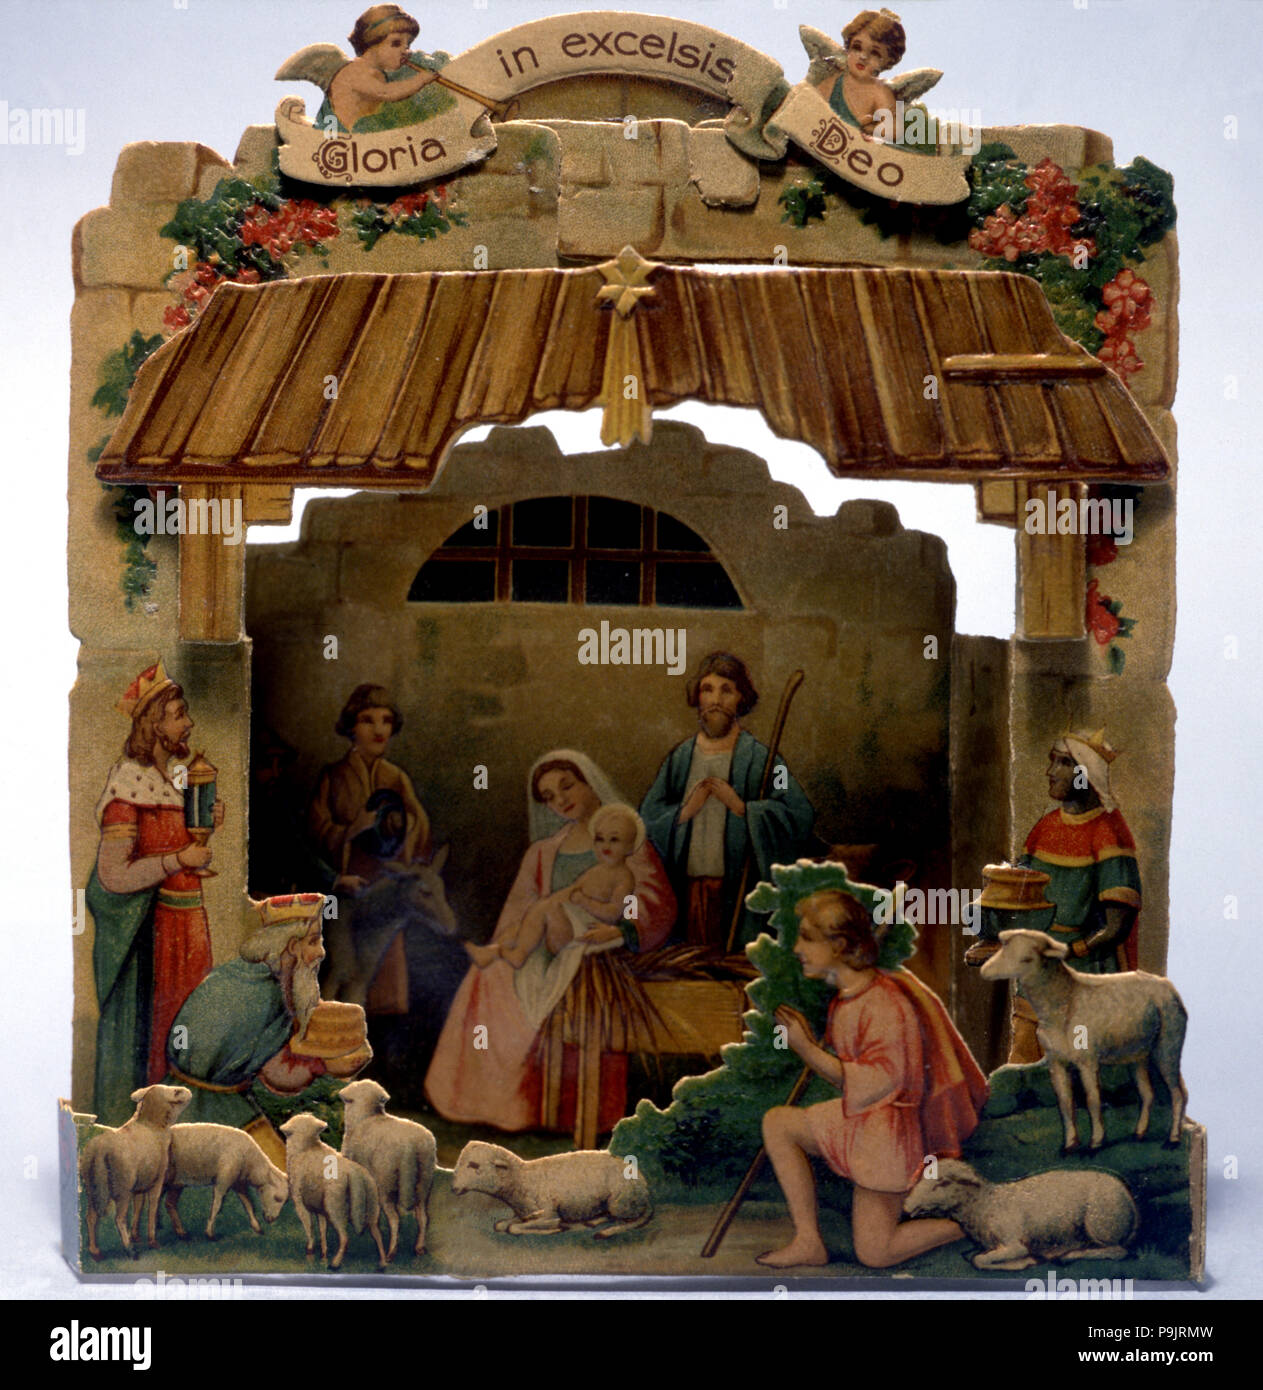 Die-cut nativity scene used as a Christmas card Stock Photo ...